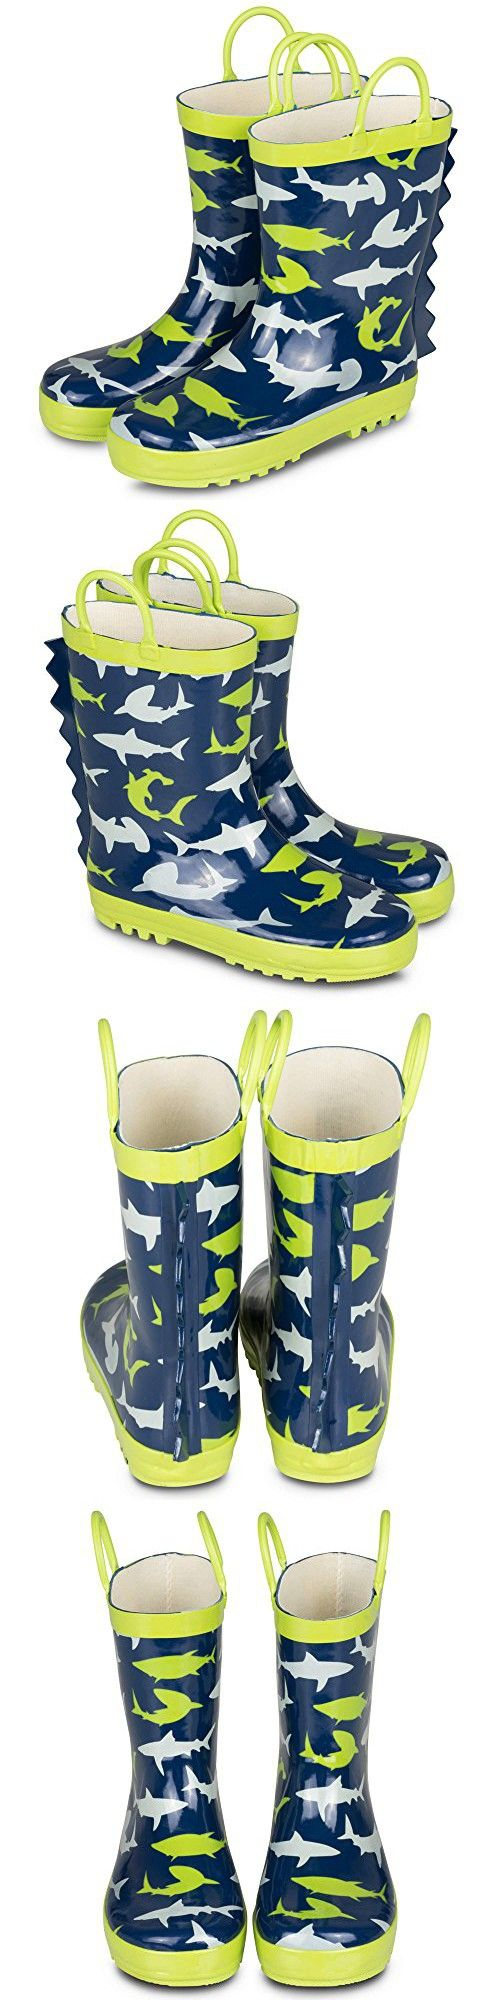 [SBR021P-SHARKPRINT-T6] Boys Rain Boots Shark Print Easy On Toddlers Size 6